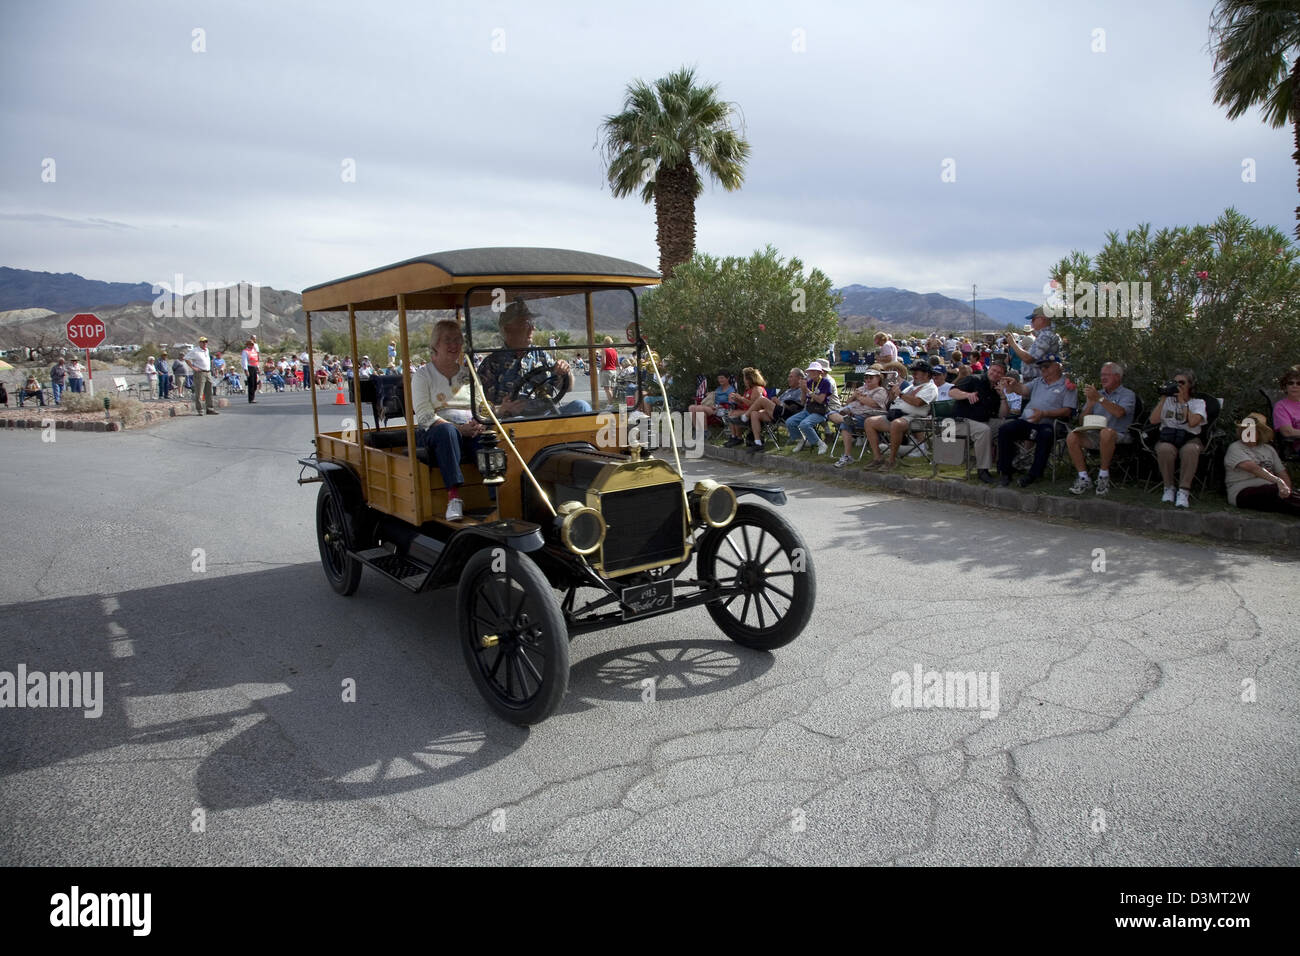 Antique car, Death Valley 49er Encampment, Death Valley National Park, CA, USA - Stock Image